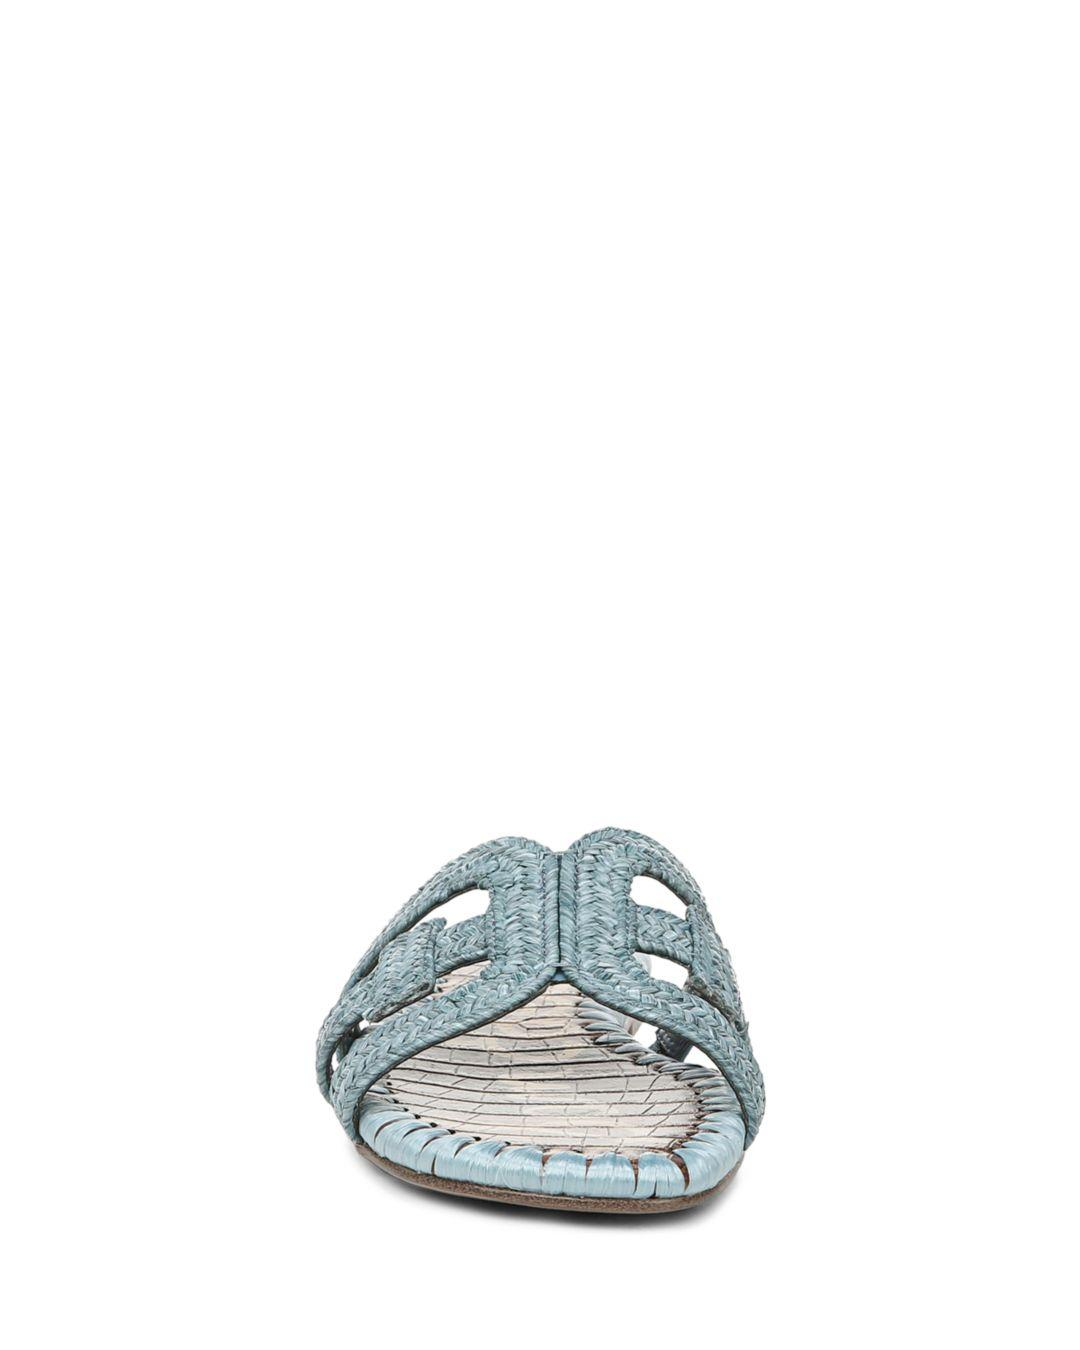 626556c2e Sam Edelman - Blue Women s Beckie Woven Slide Sandals - Lyst. View  fullscreen